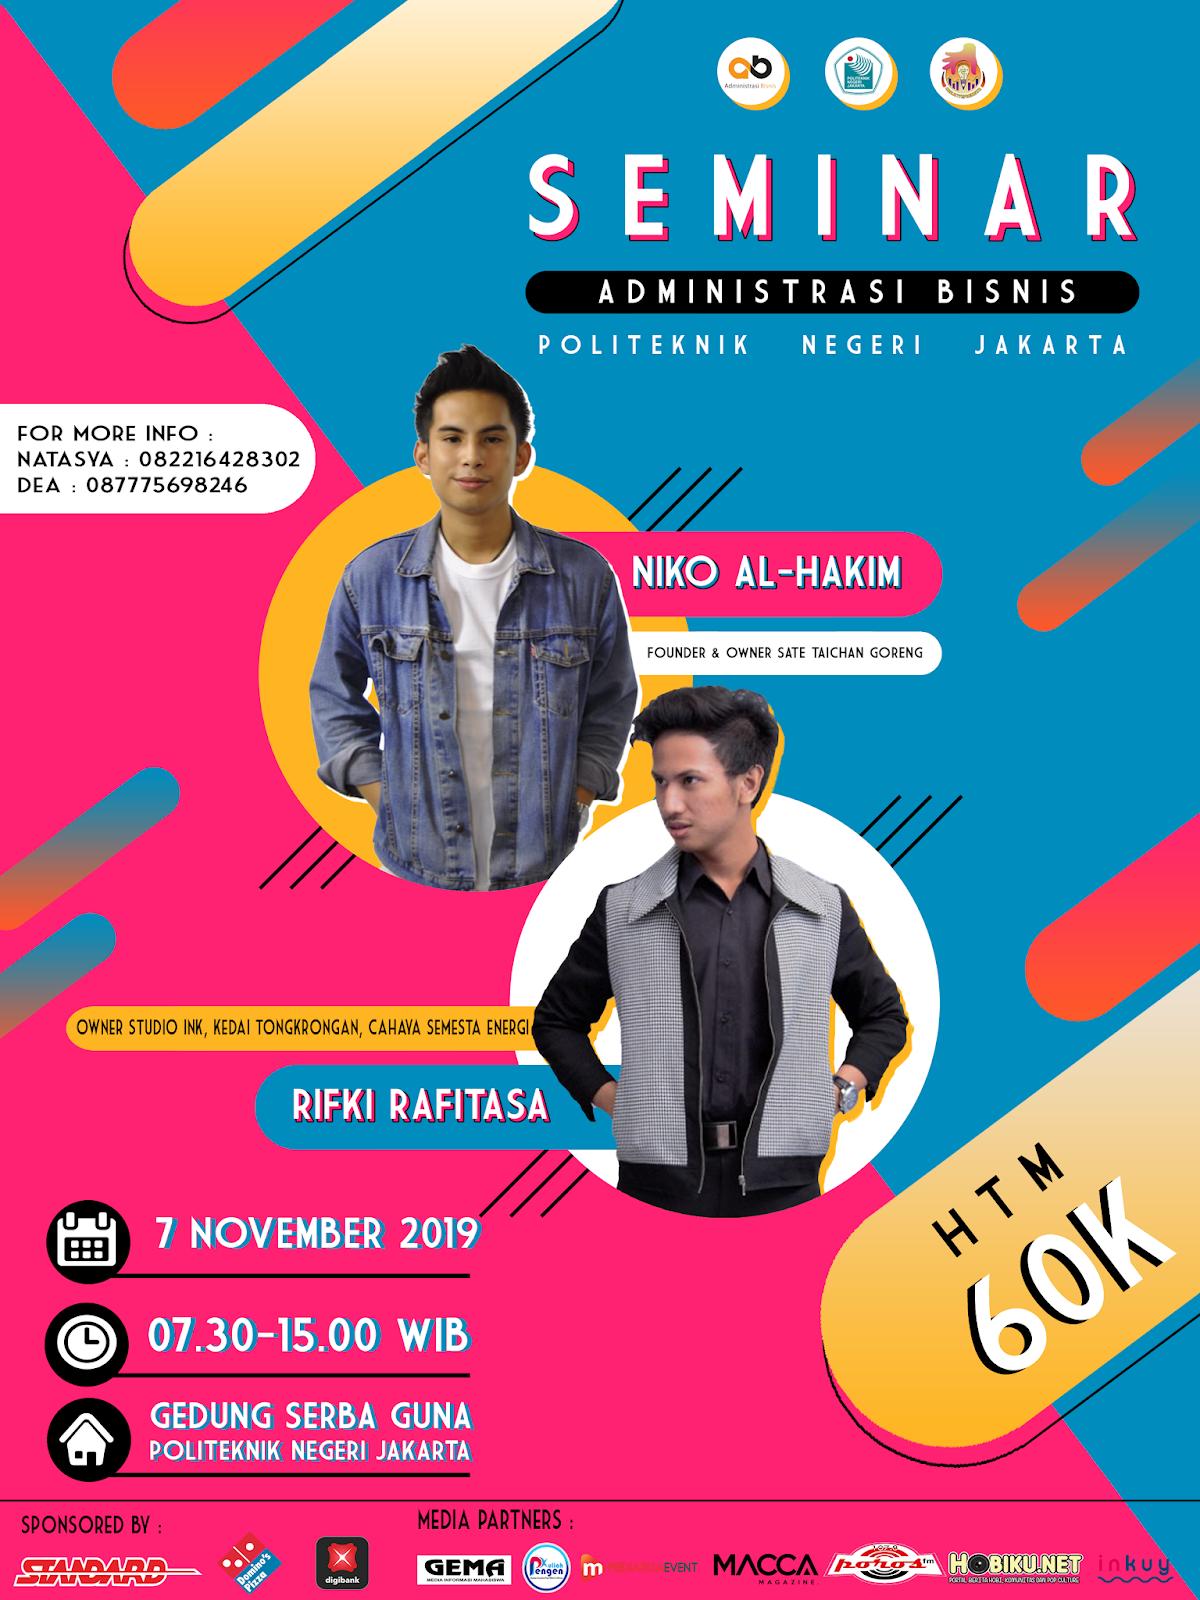 Politeknik Negeri Jakarta - Seminar AB 2019